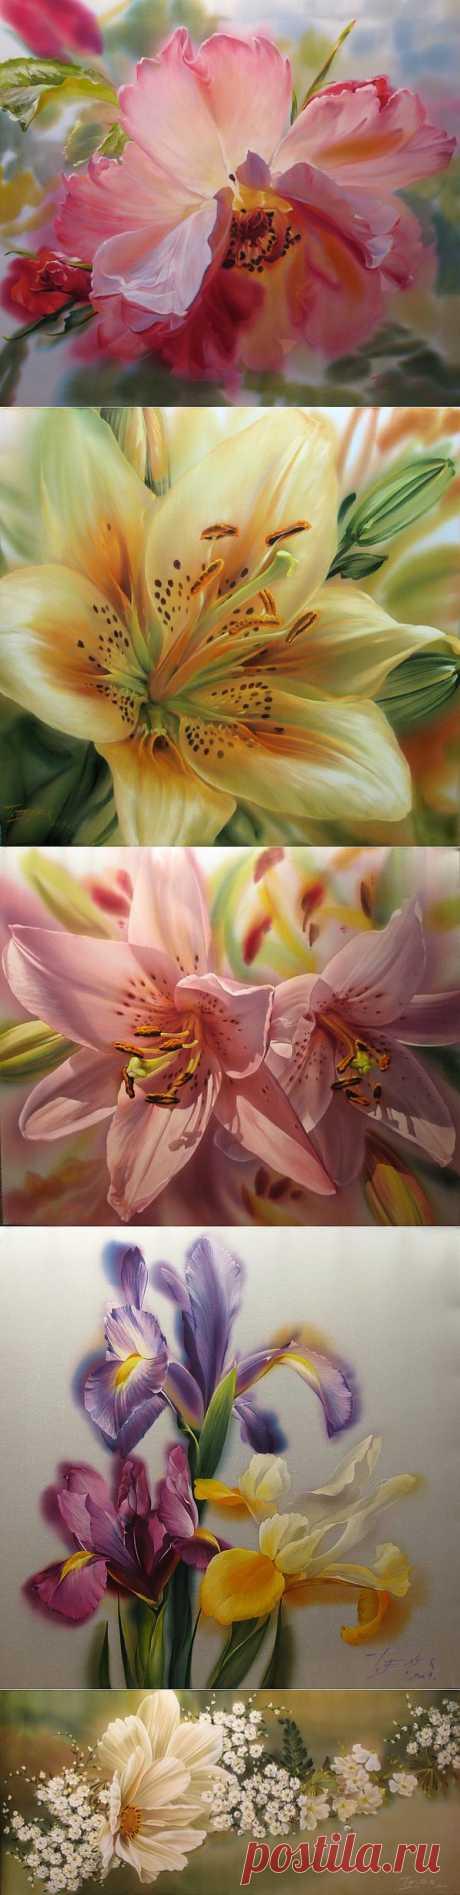 Красота цветов Елены Тенер.Батик..